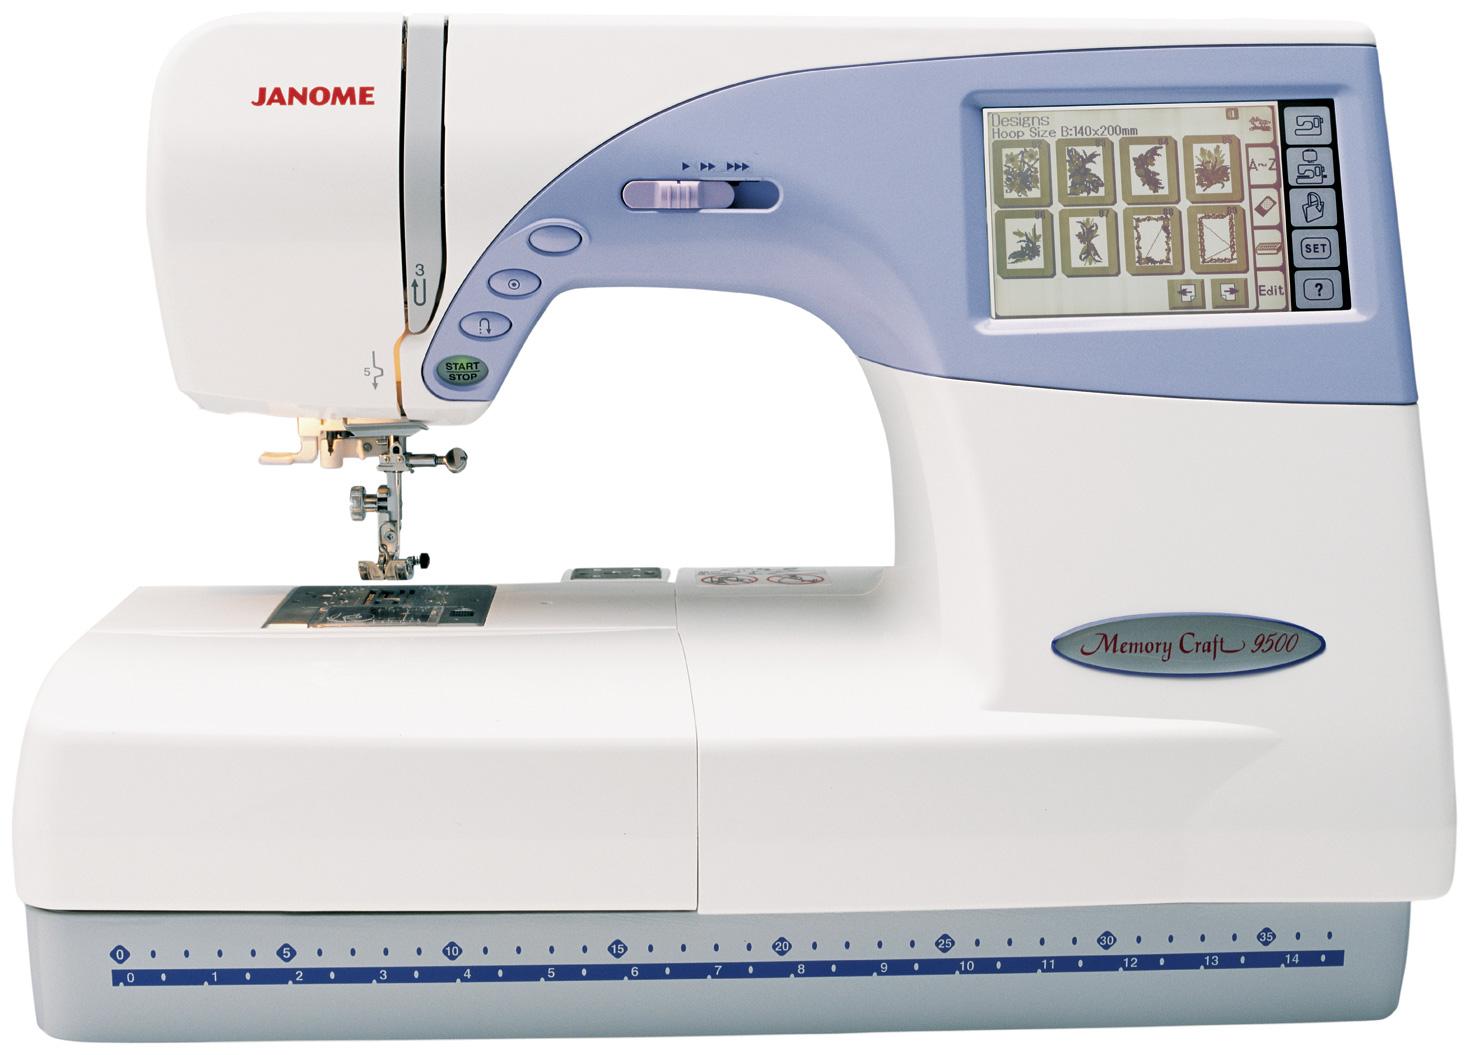 Janome memory craft 9000 - Janome Memory Craft 9500 Fs Computerized Embroidery Sewing Machine